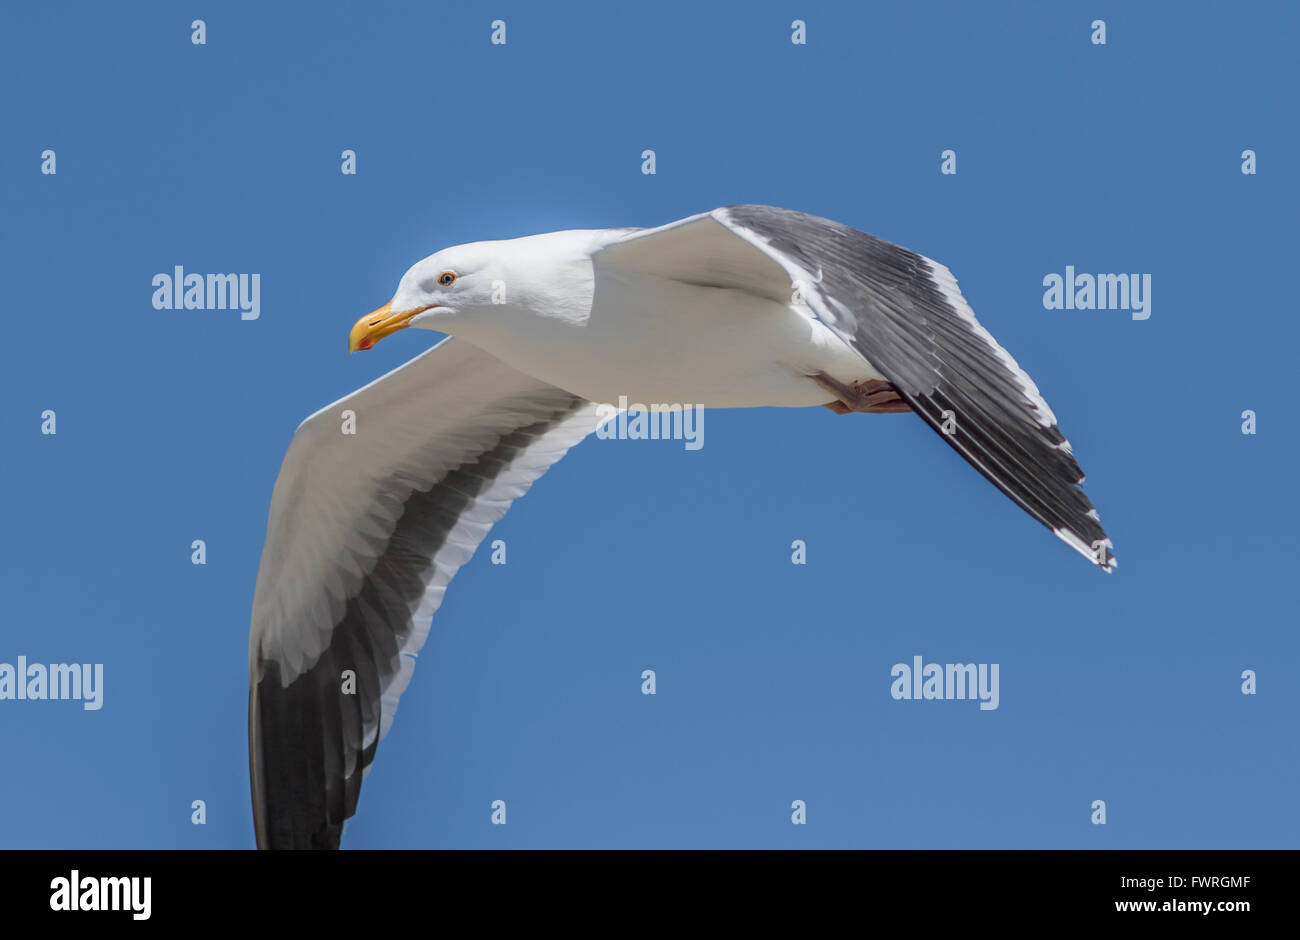 Western gull at Moss Landing California - Stock Image